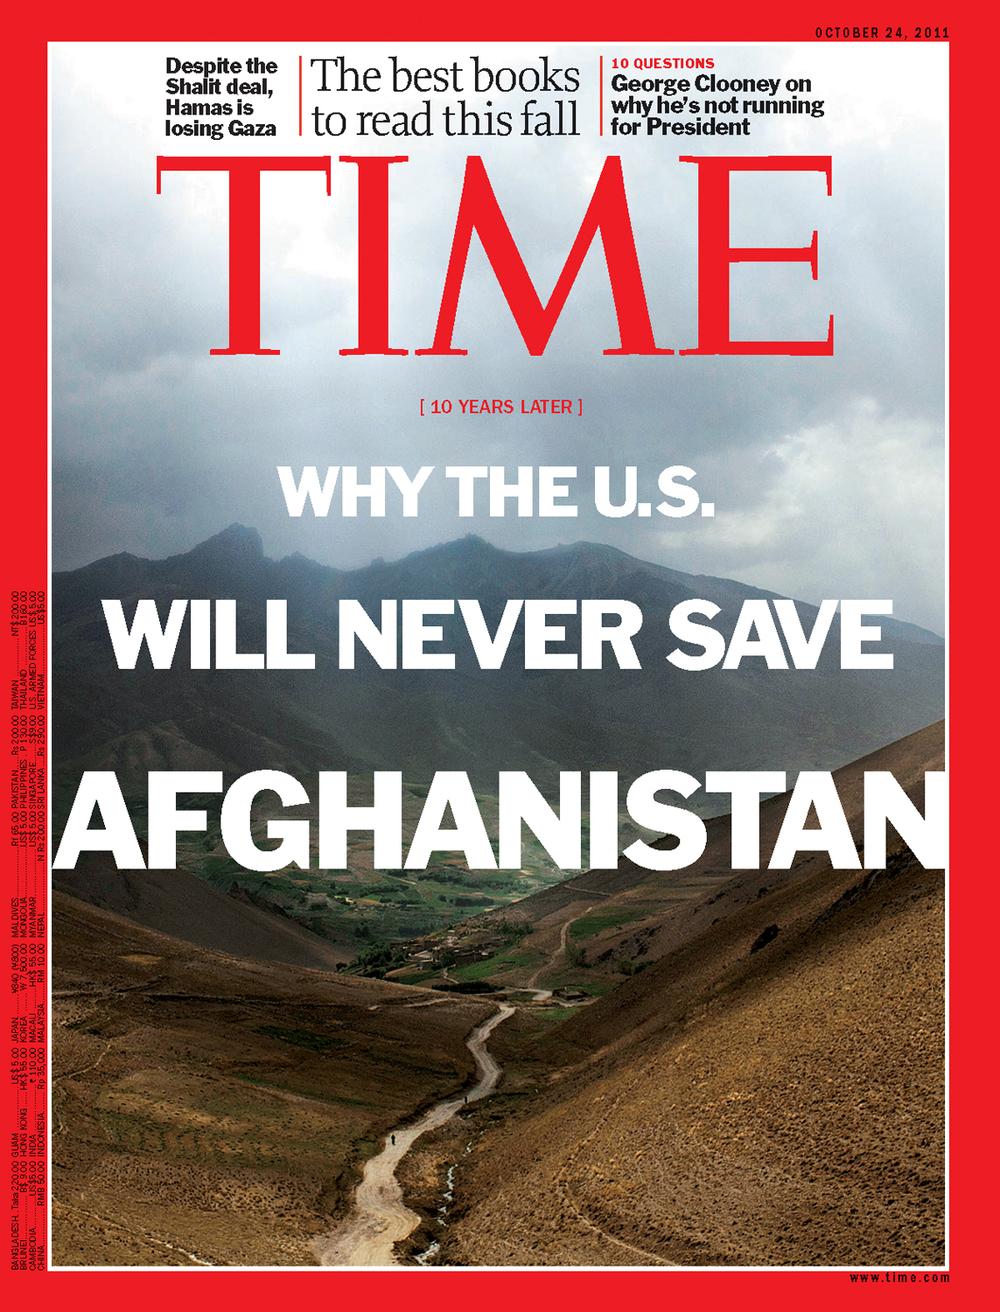 'The Unwinnable War', Time Magazine, October 24, 2011.